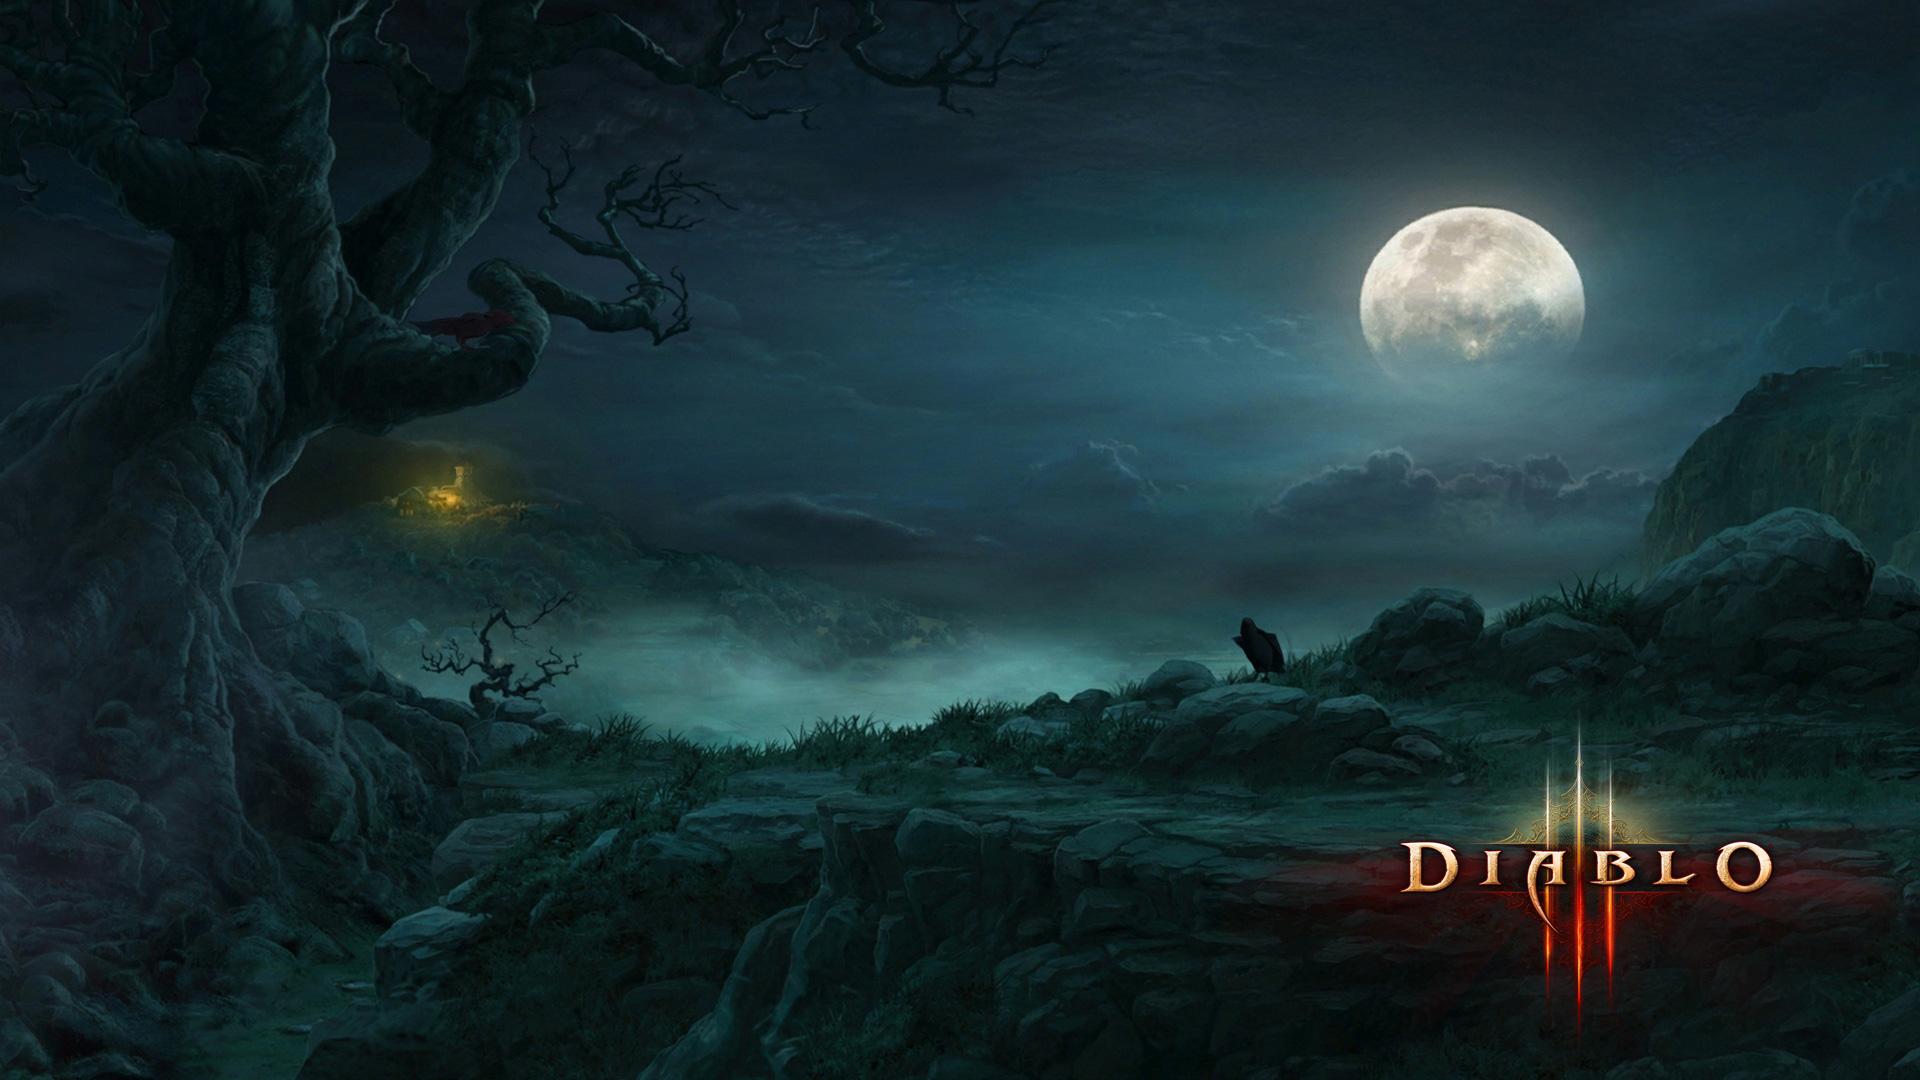 Diablo 3 wallpaper 39